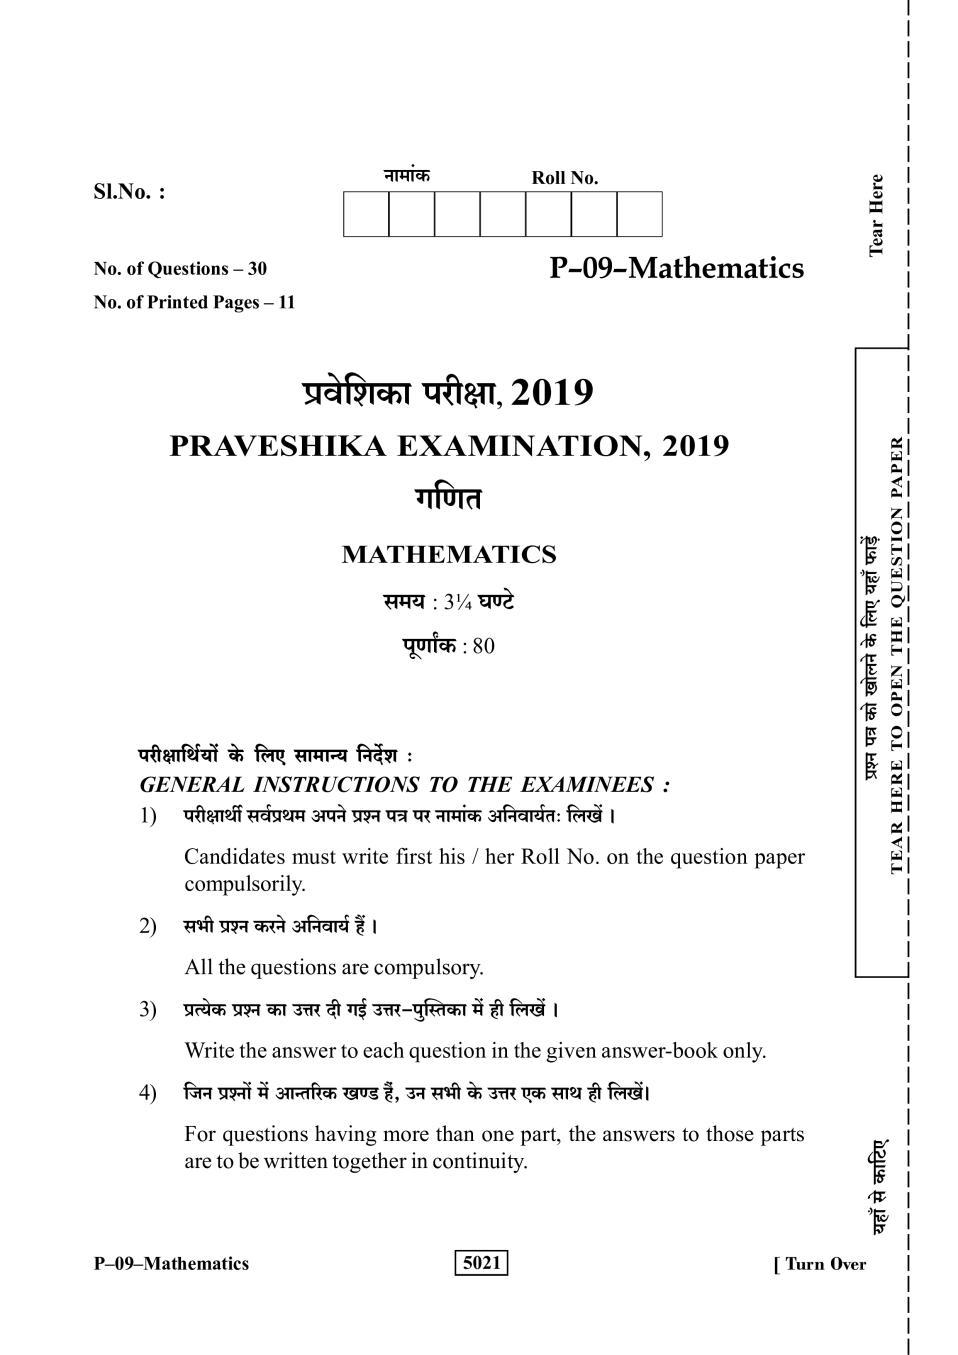 Rajasthan Board Praveshika Mathematics Question Paper 2019 - Page 1